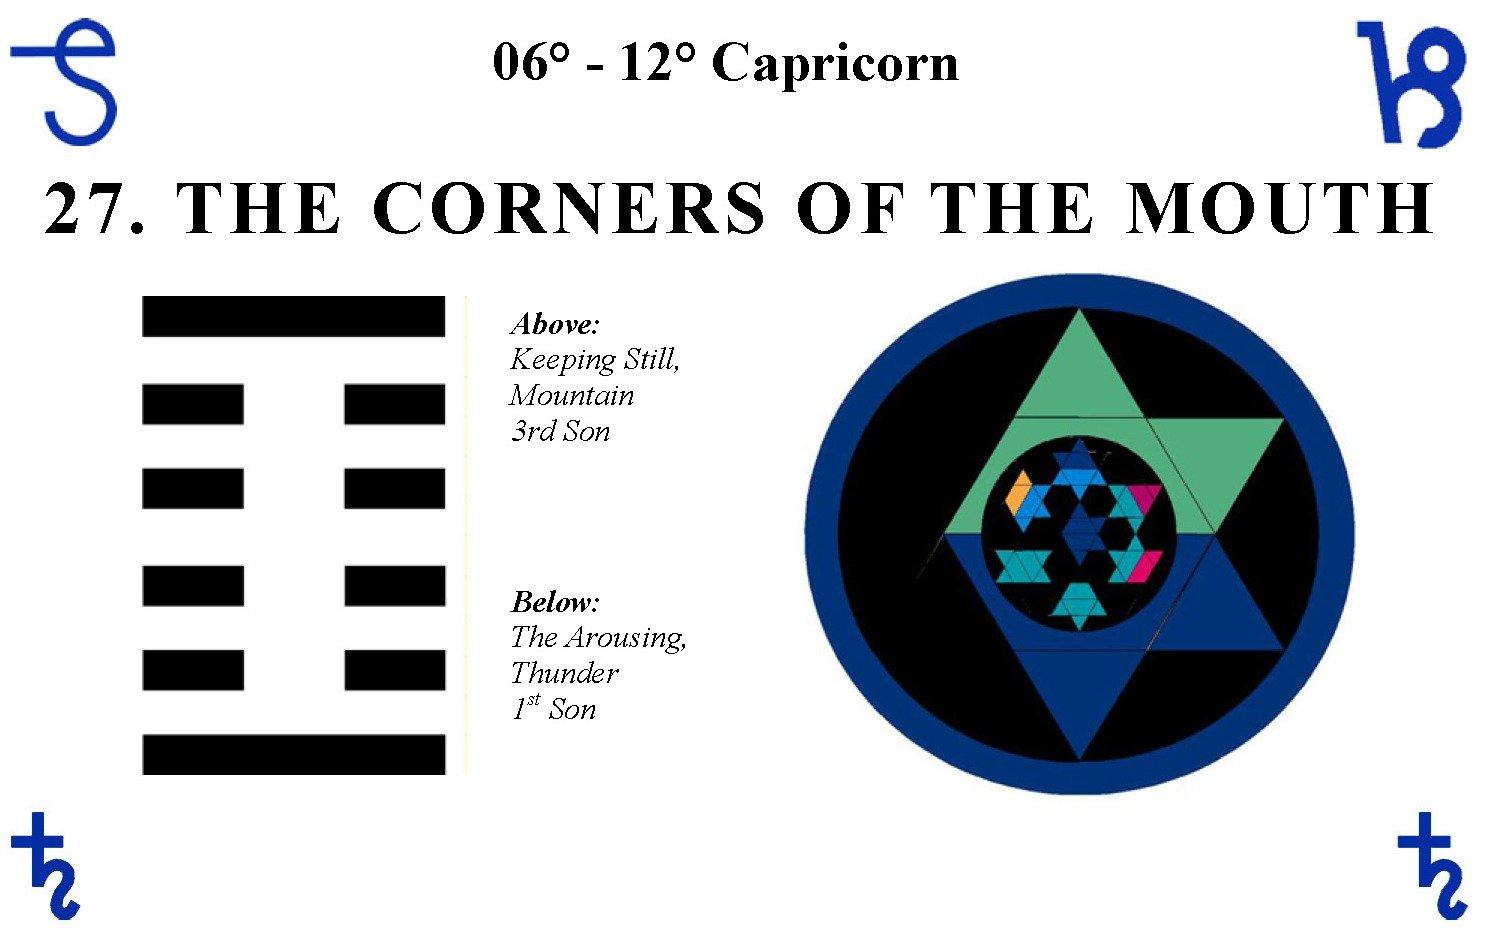 Hx27-Corners-of-the-mouth